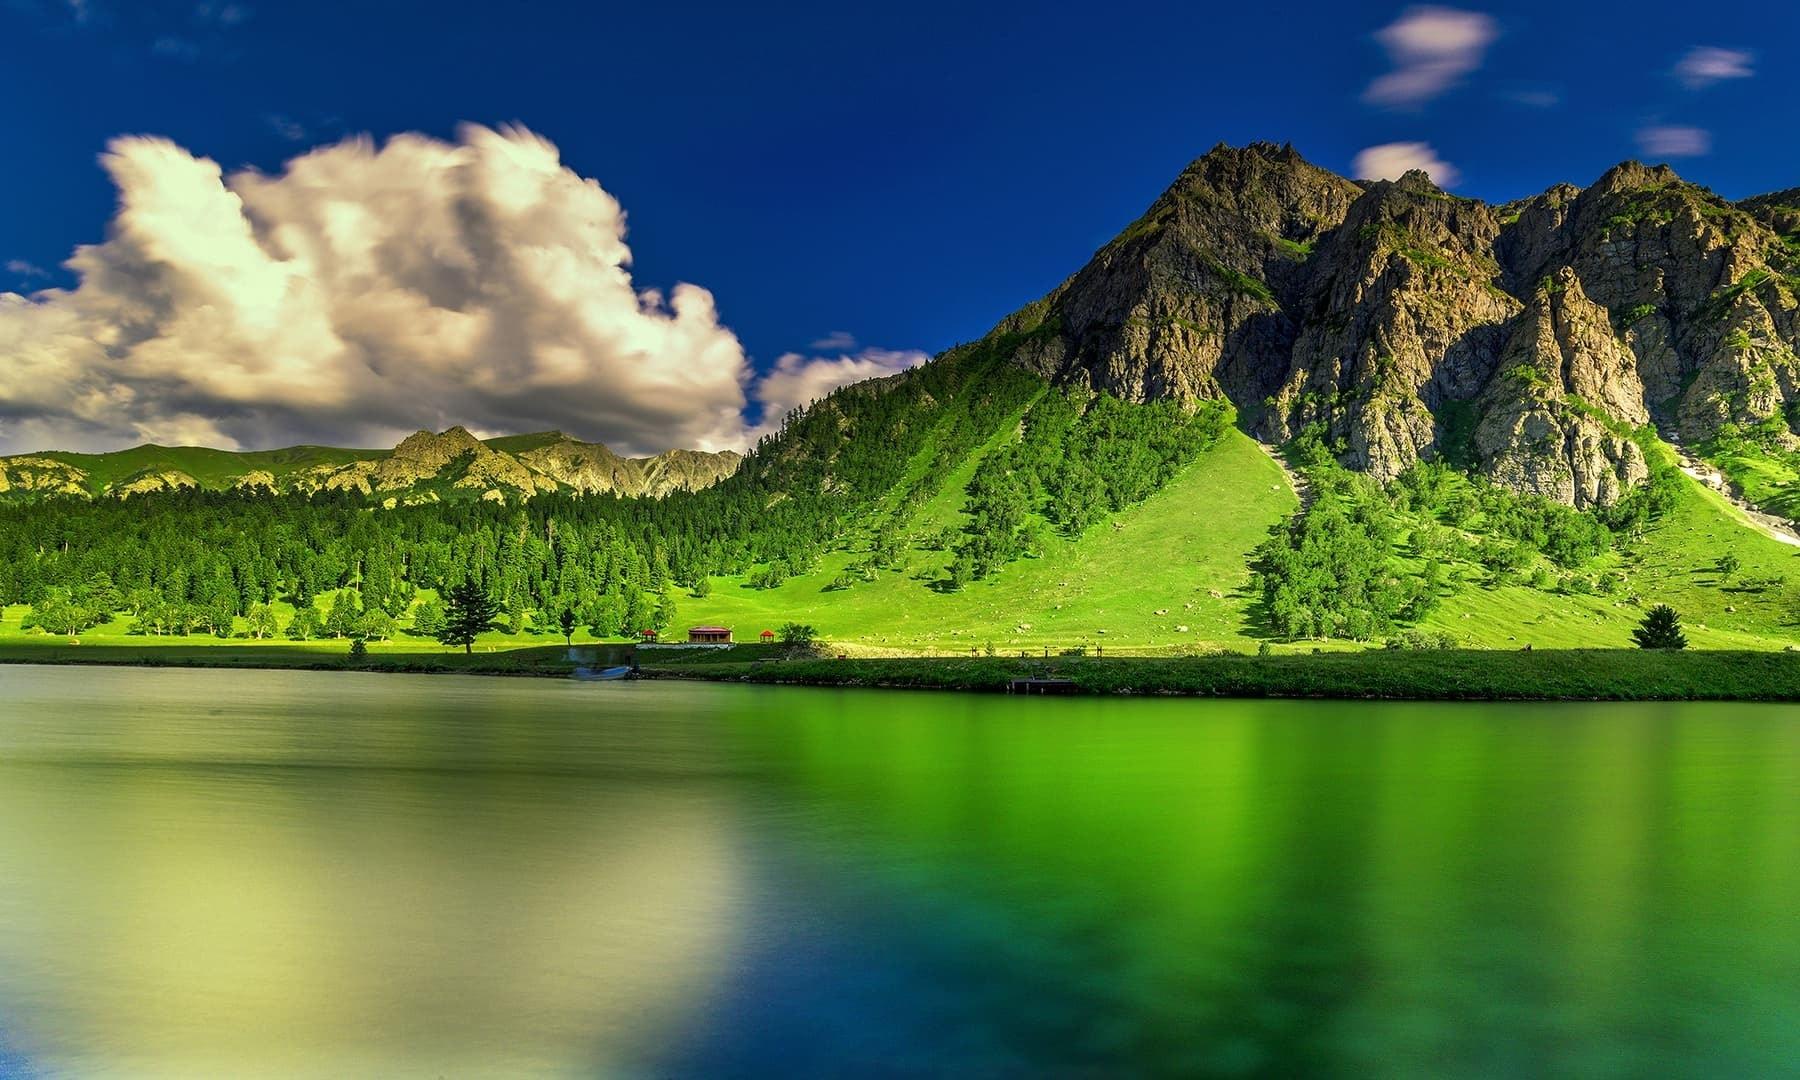 View of the lake. — Photo by Syed Mehdi Bukhari